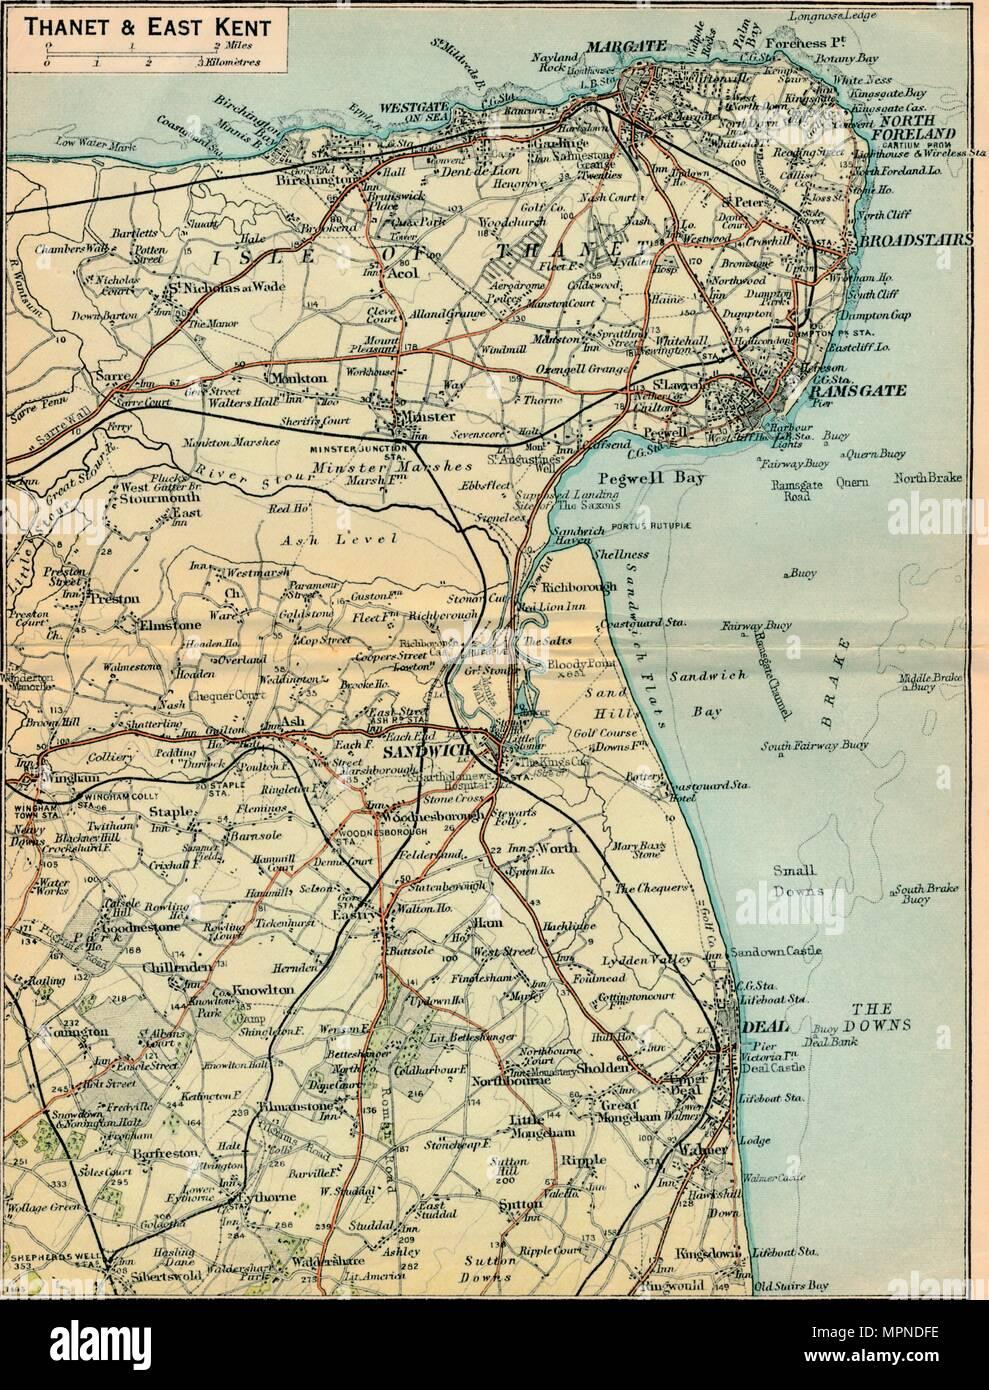 'Thanet & East Kent', c20th Century. Artist: John Bartholomew. - Stock Image